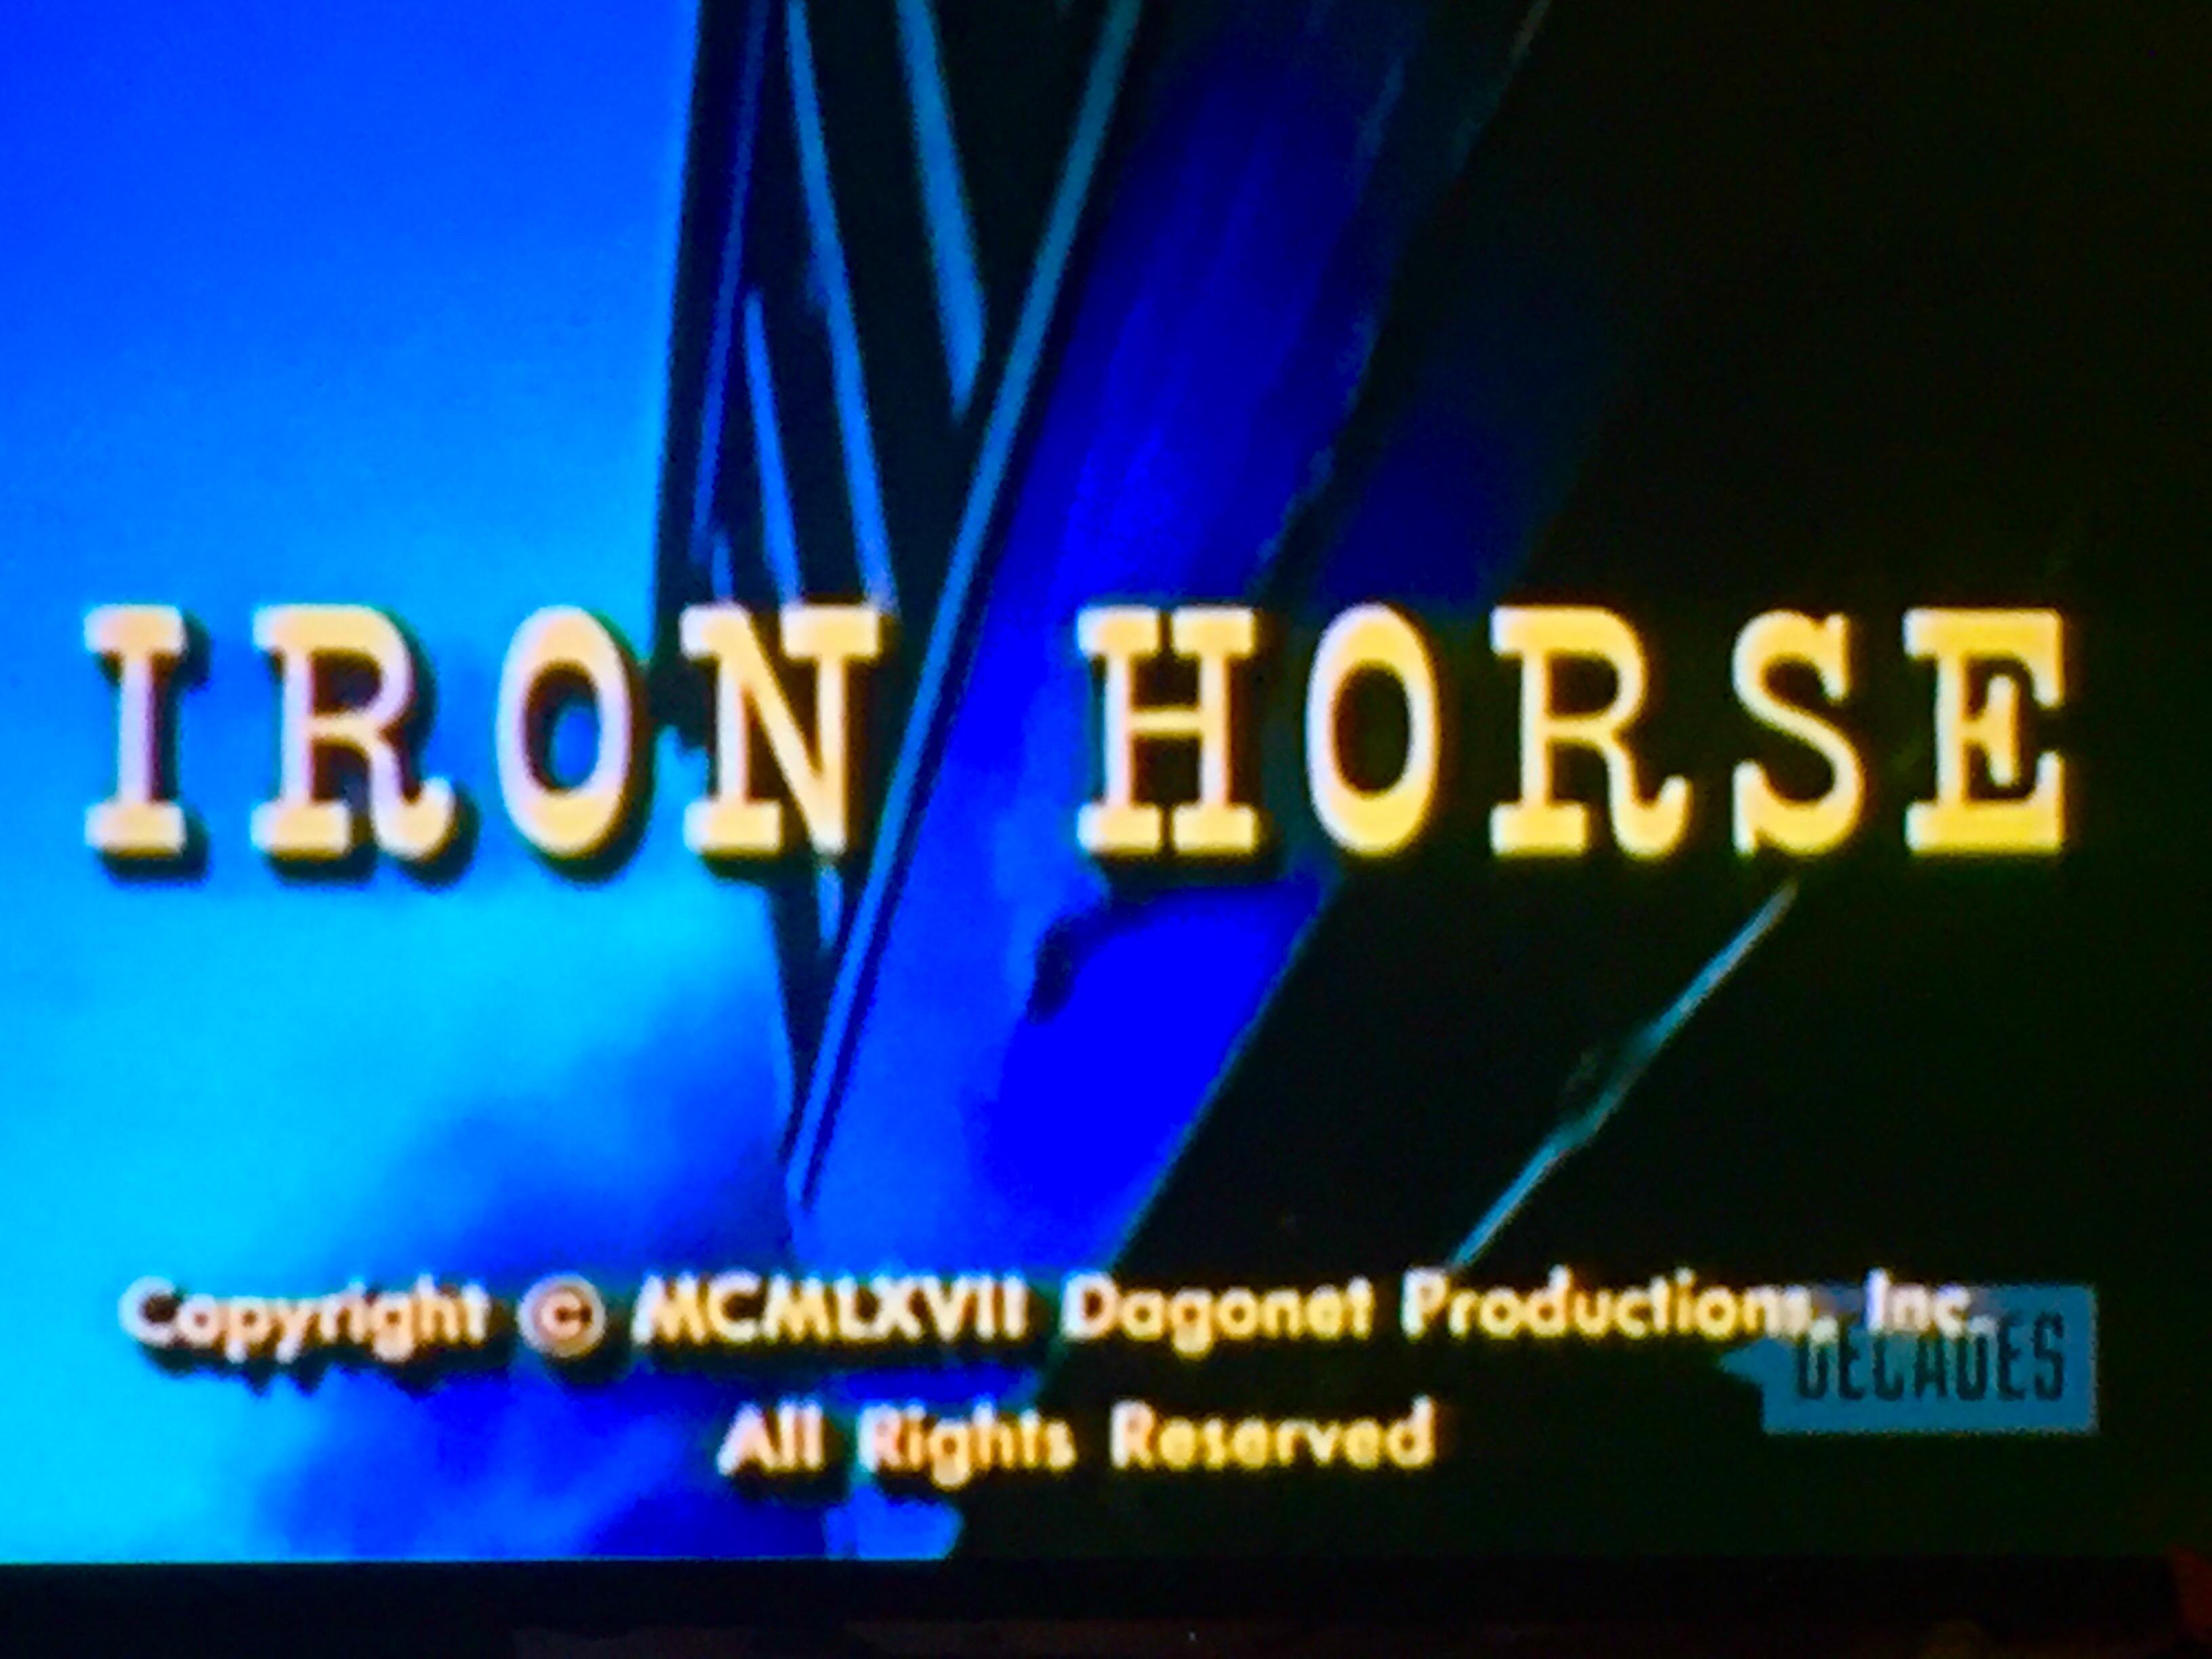 Iron Horse (1966)